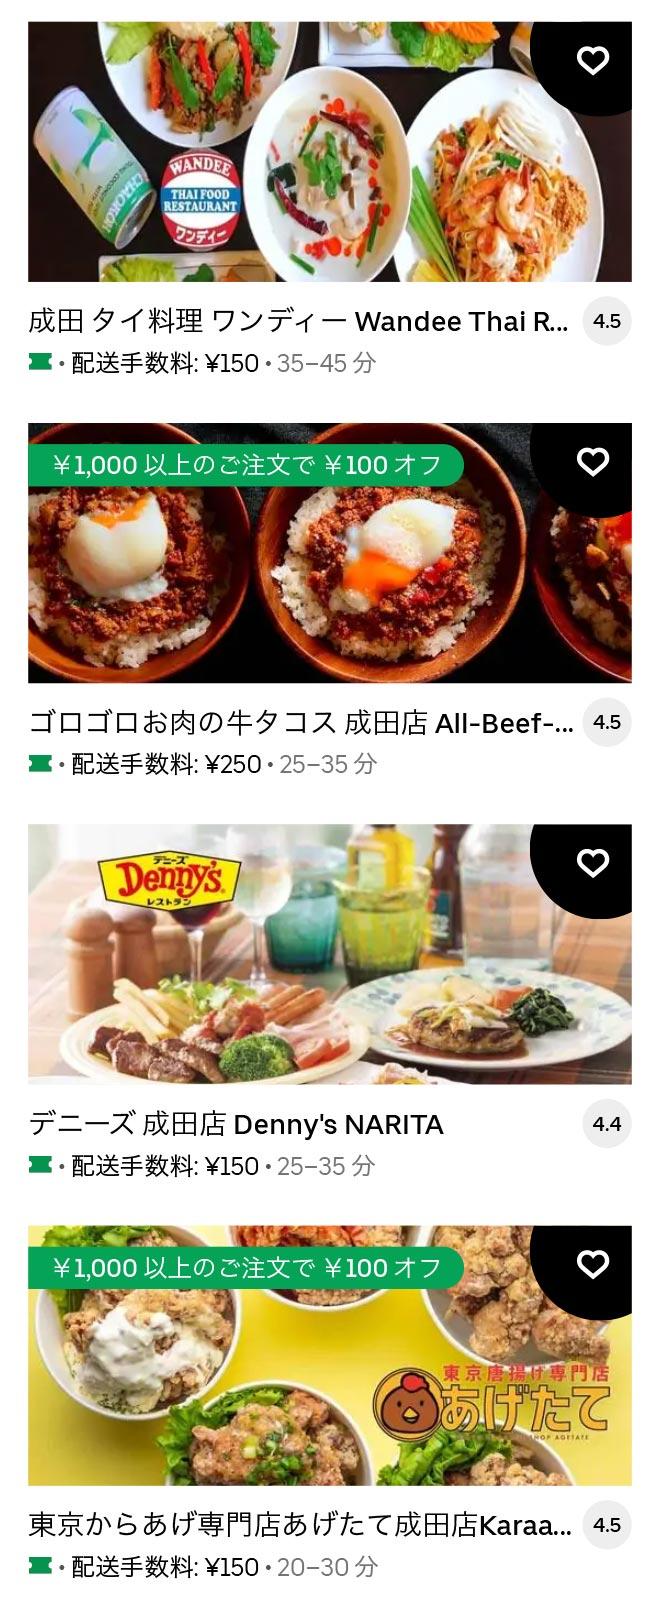 U narita menu 2104 03